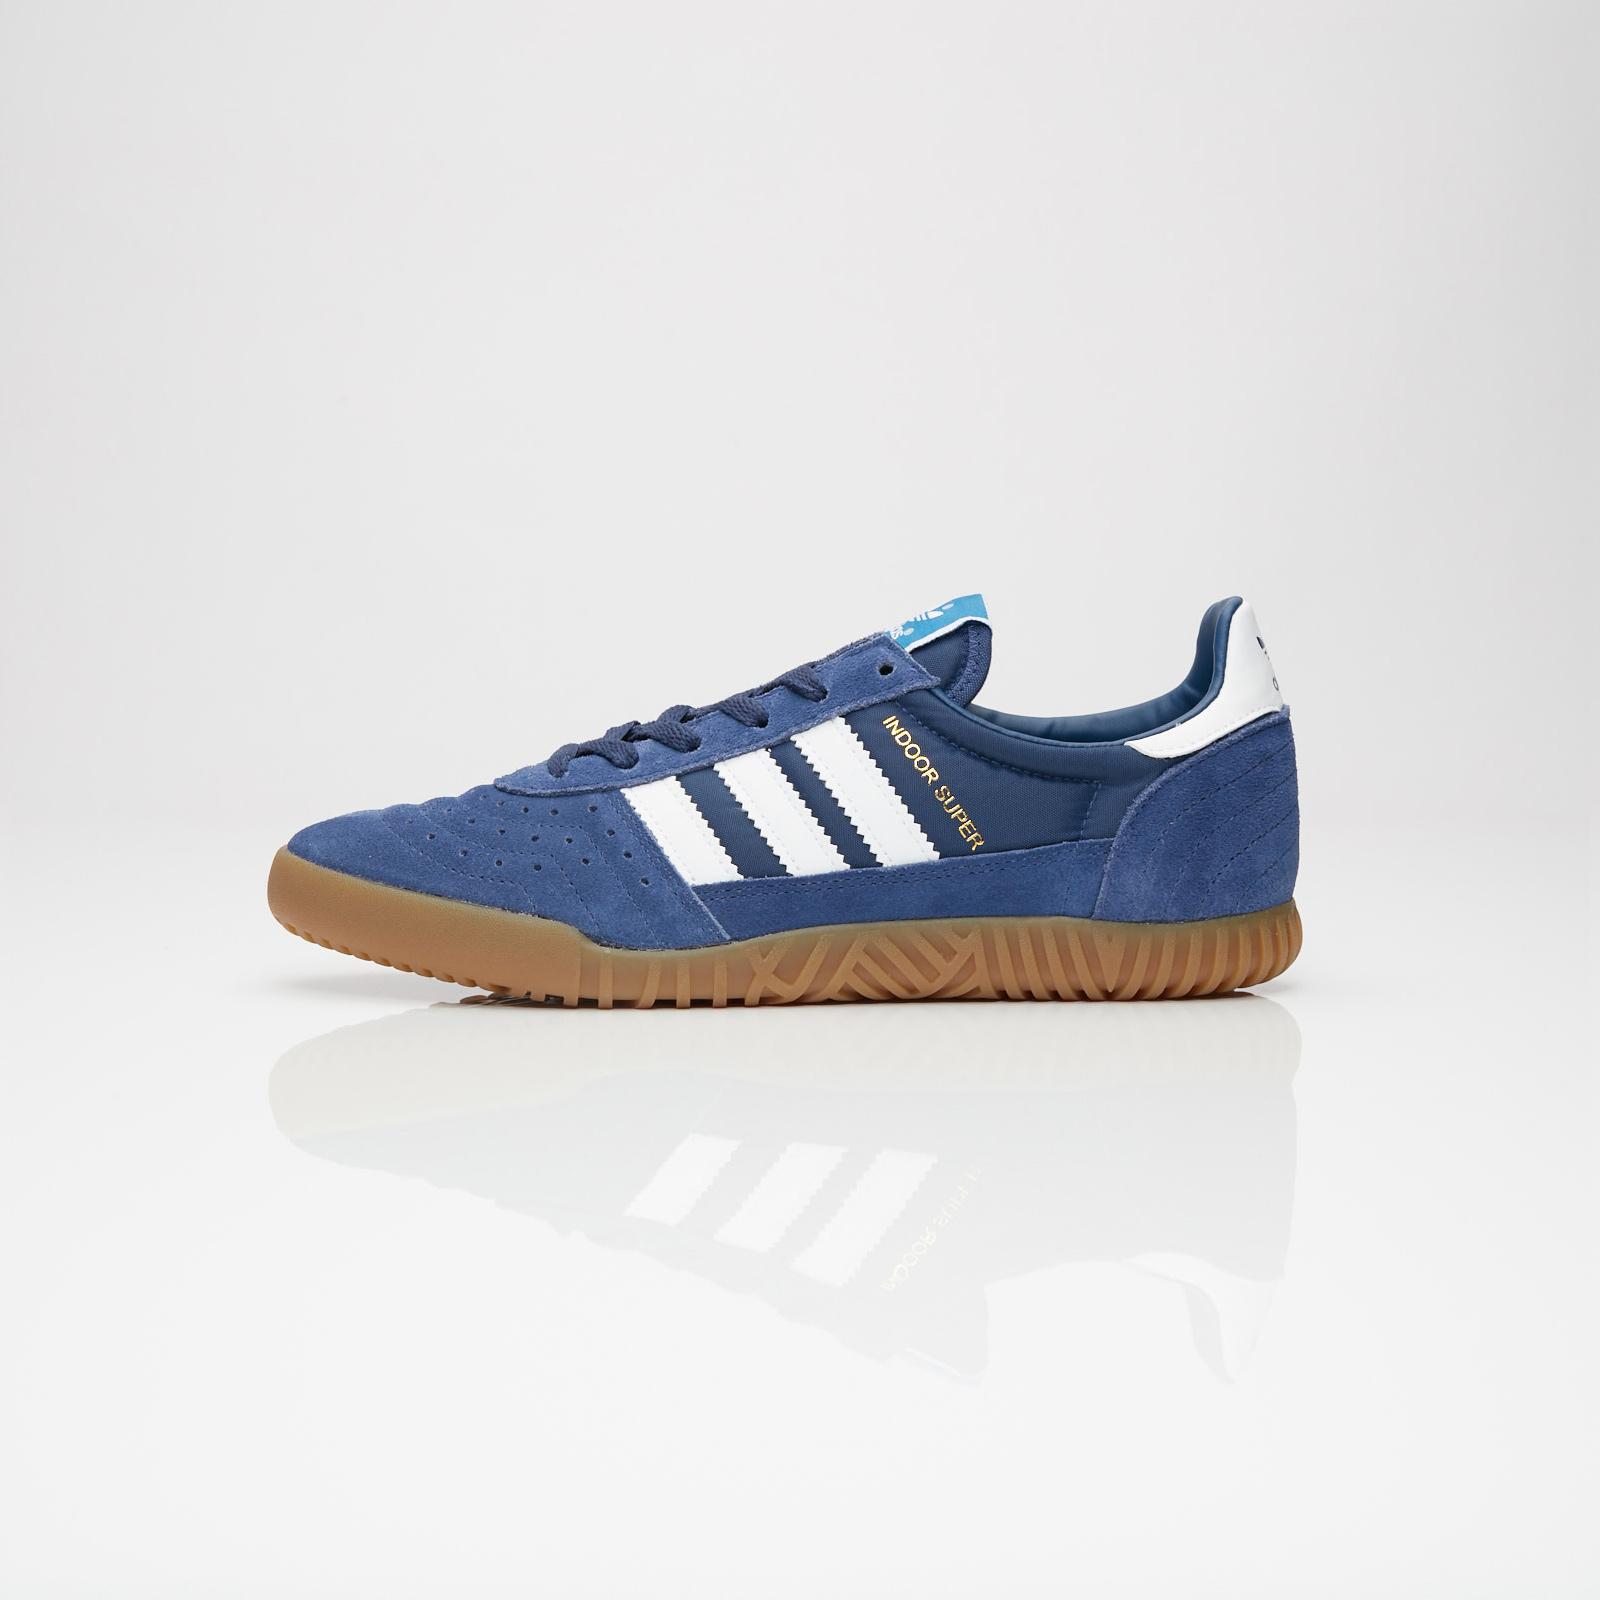 adidas Indoor Super - B41522 - SNS | sneakers & streetwear online ...